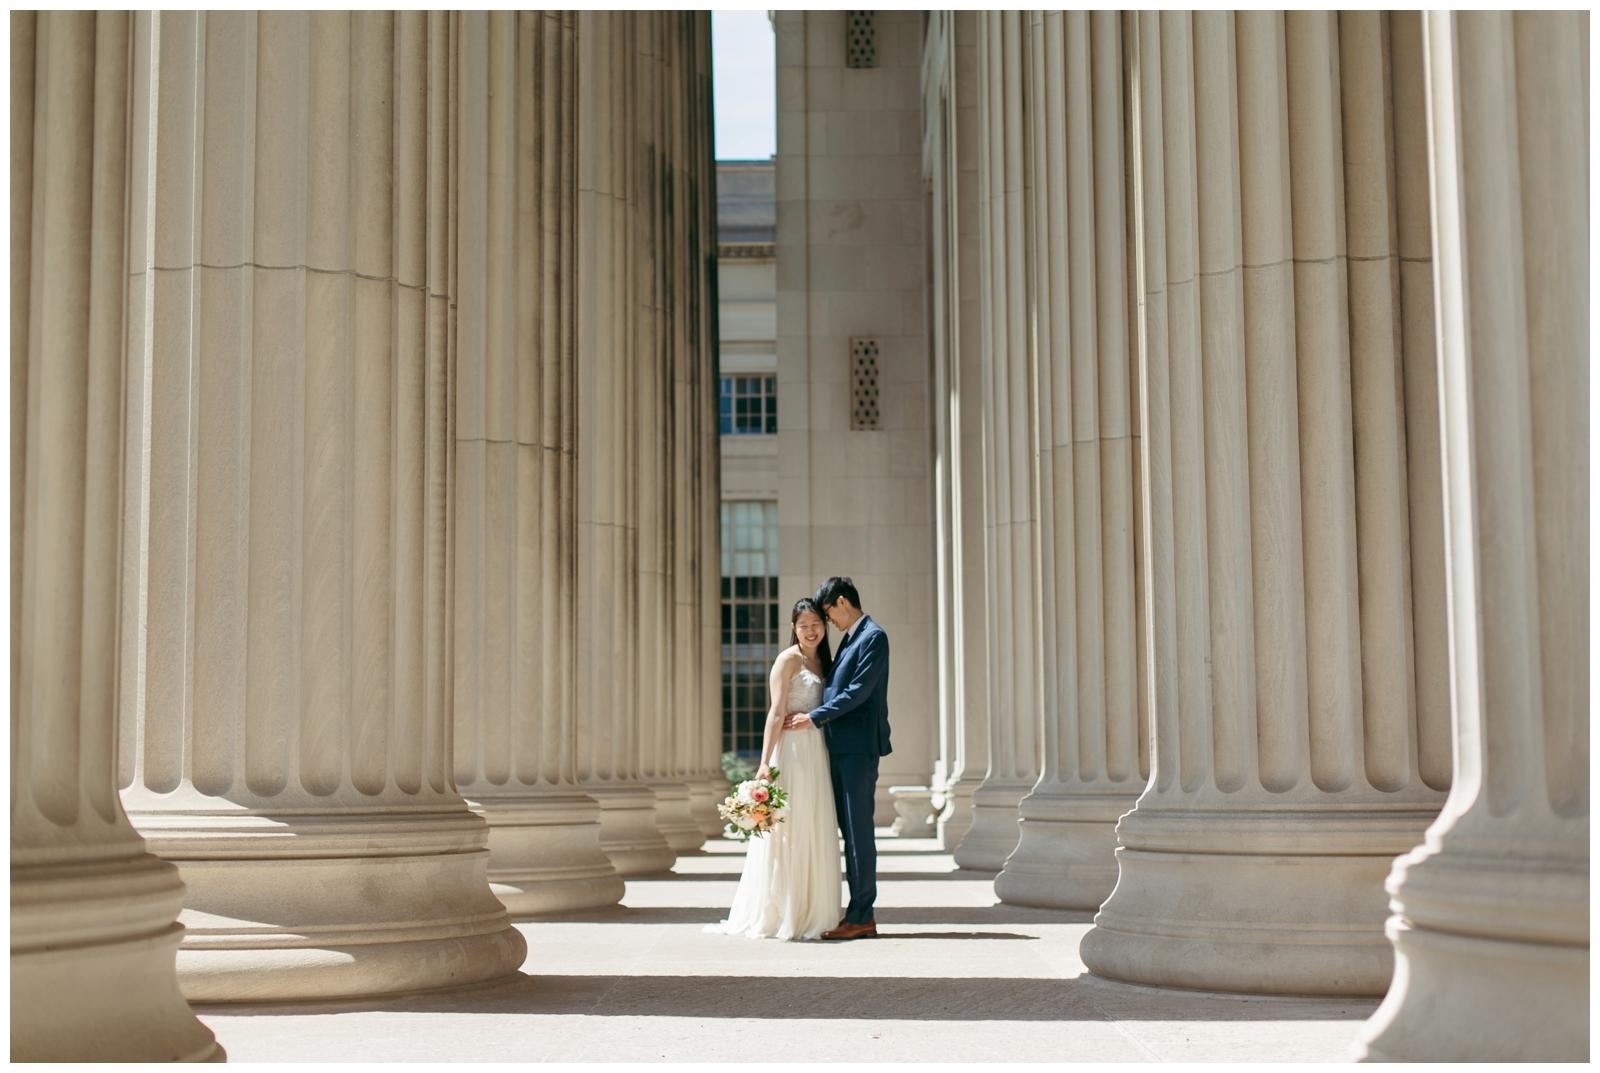 Samberg-Conference-Center-Boston-Wedding-Photographer-Bailey-Q-Photo-001.jpg